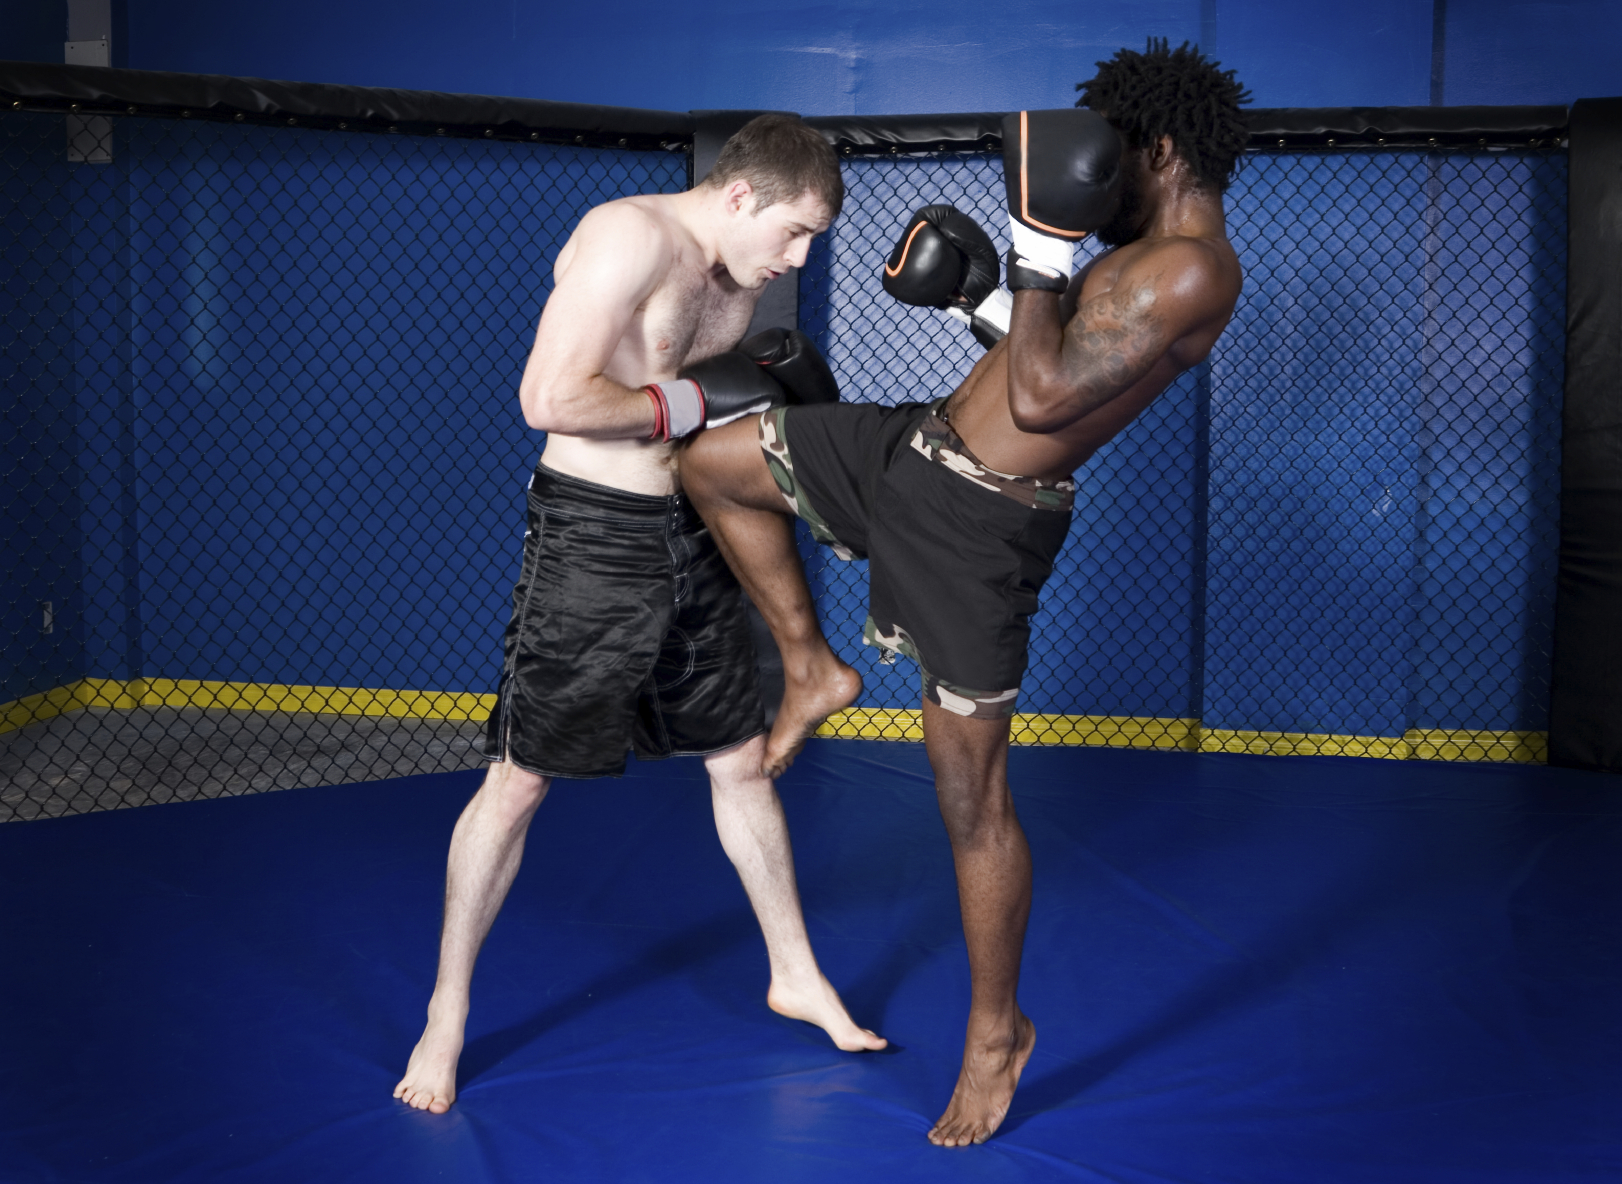 martial art program at Spring Grove Flying Dragons, Spring Grove